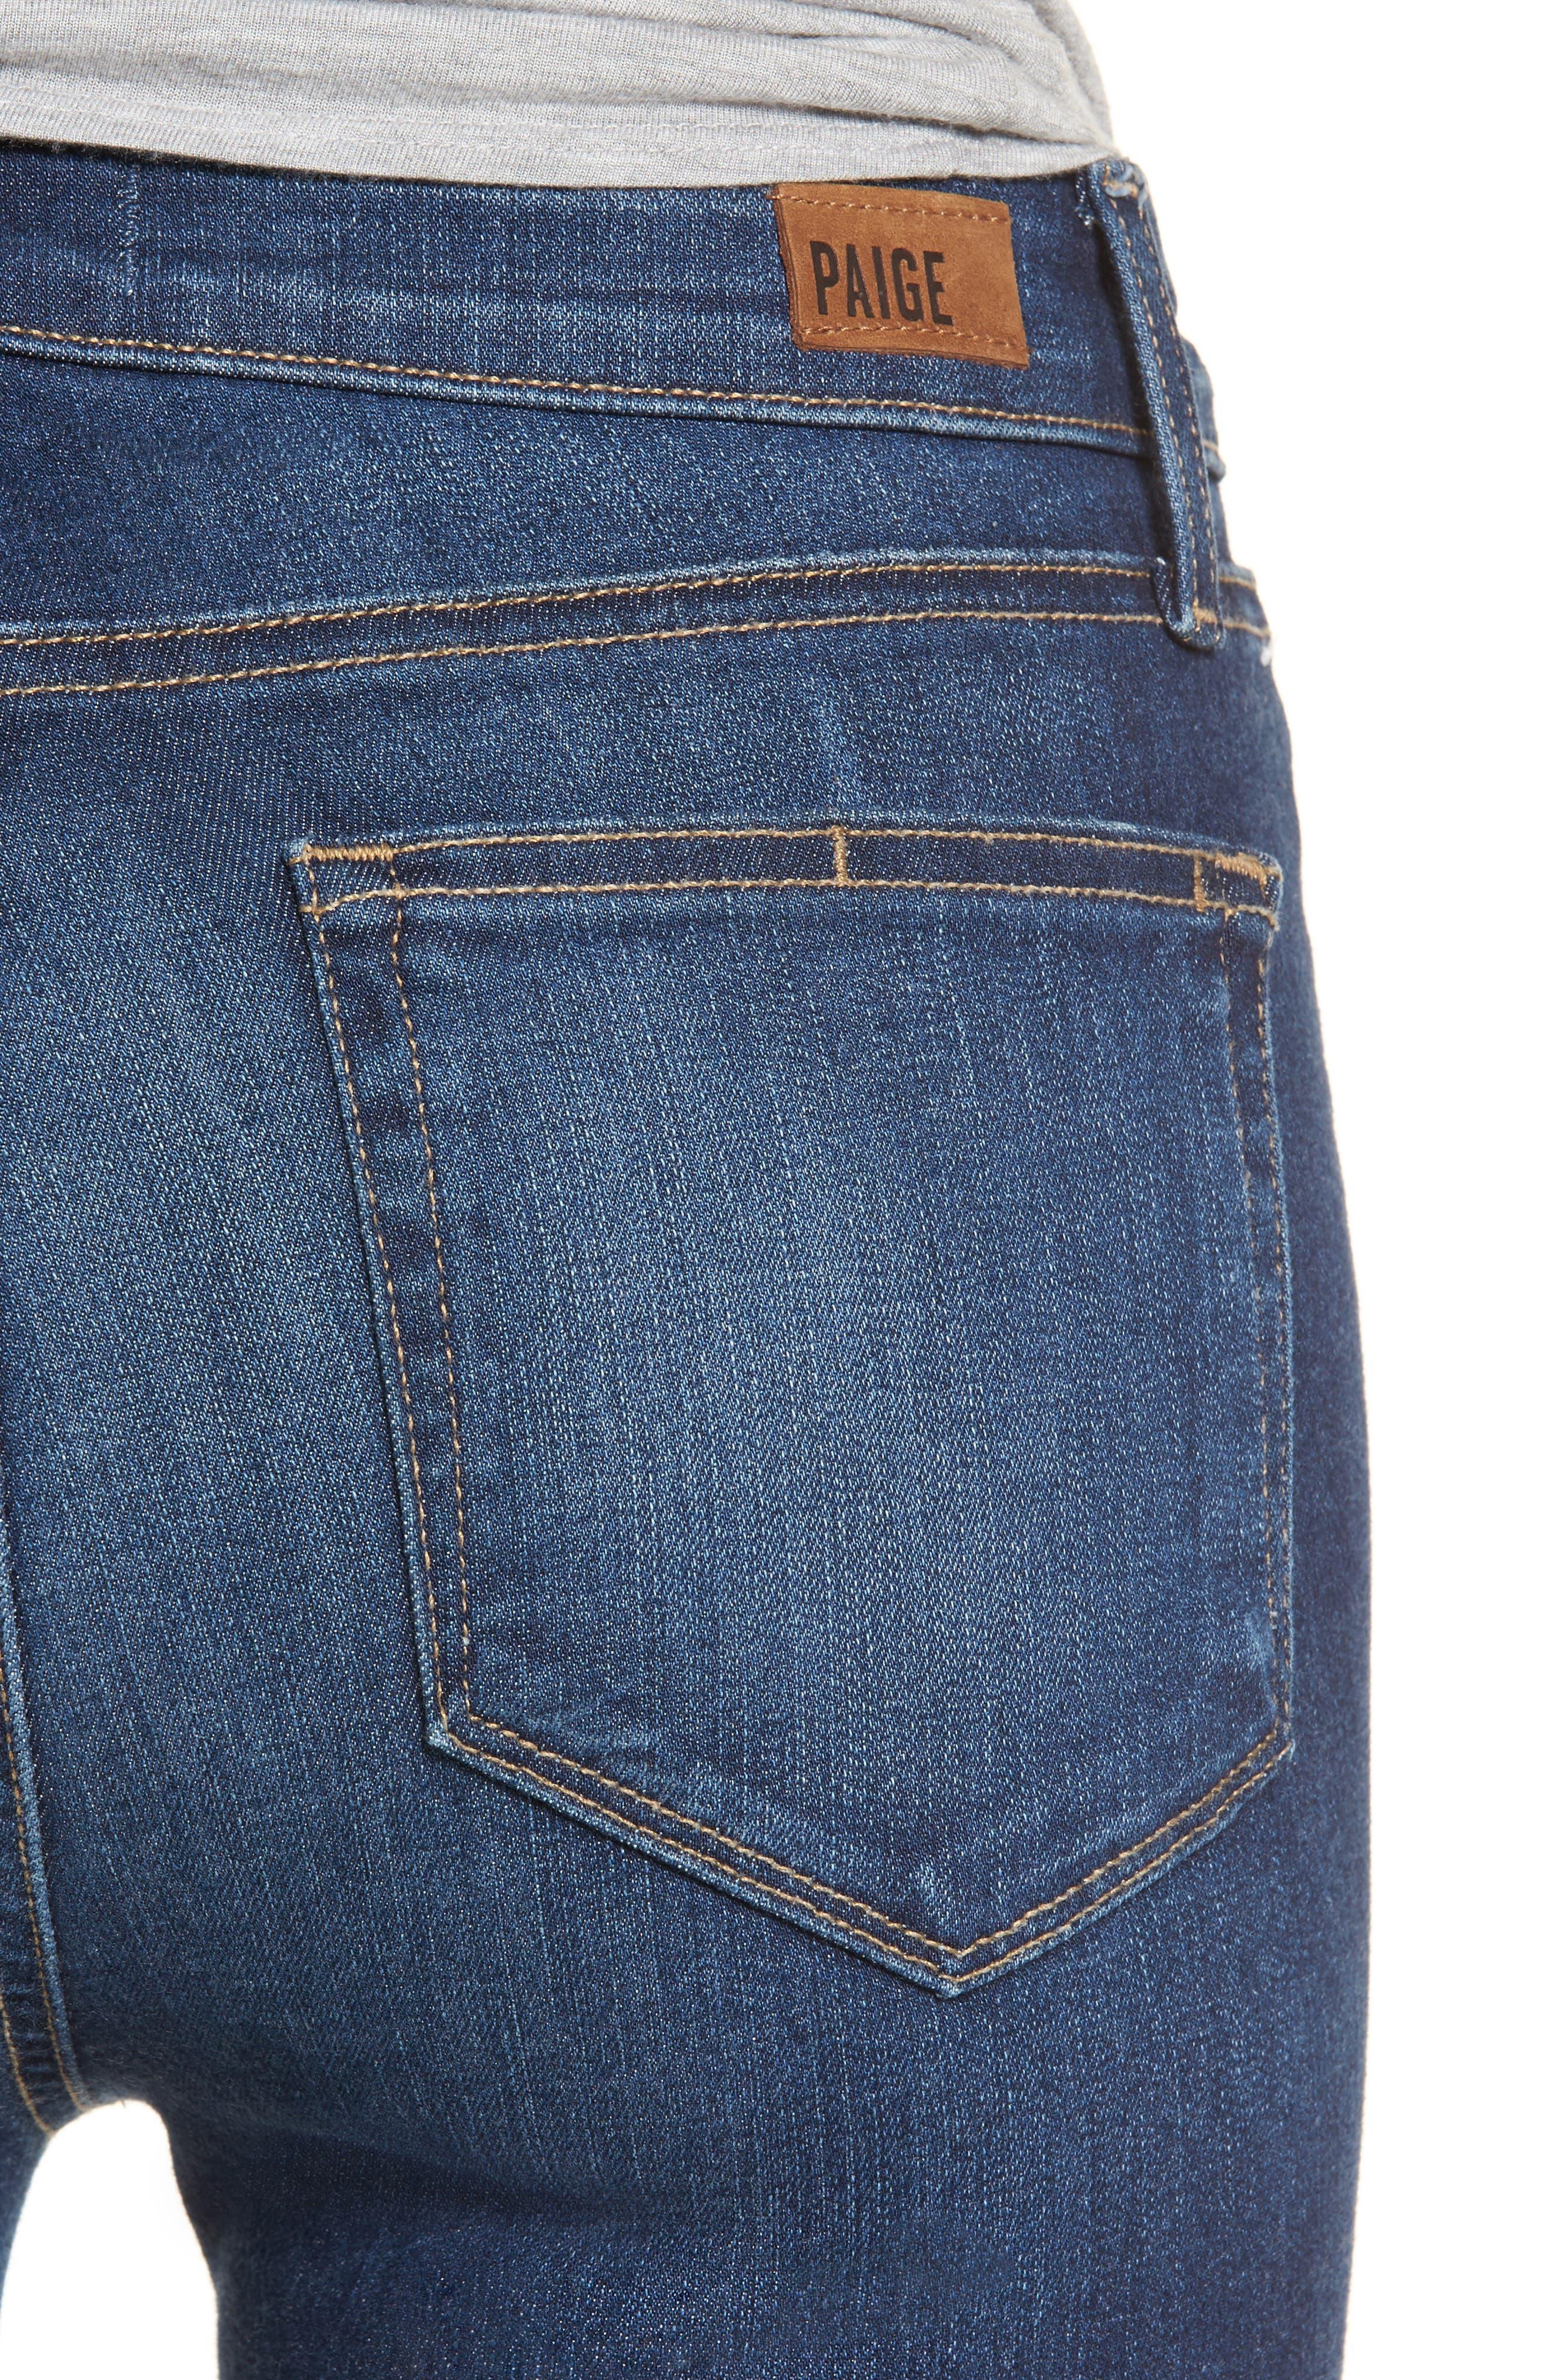 Transcend Vintage - Hoxton High Waist Ankle Skinny Jeans,                             Alternate thumbnail 4, color,                             400